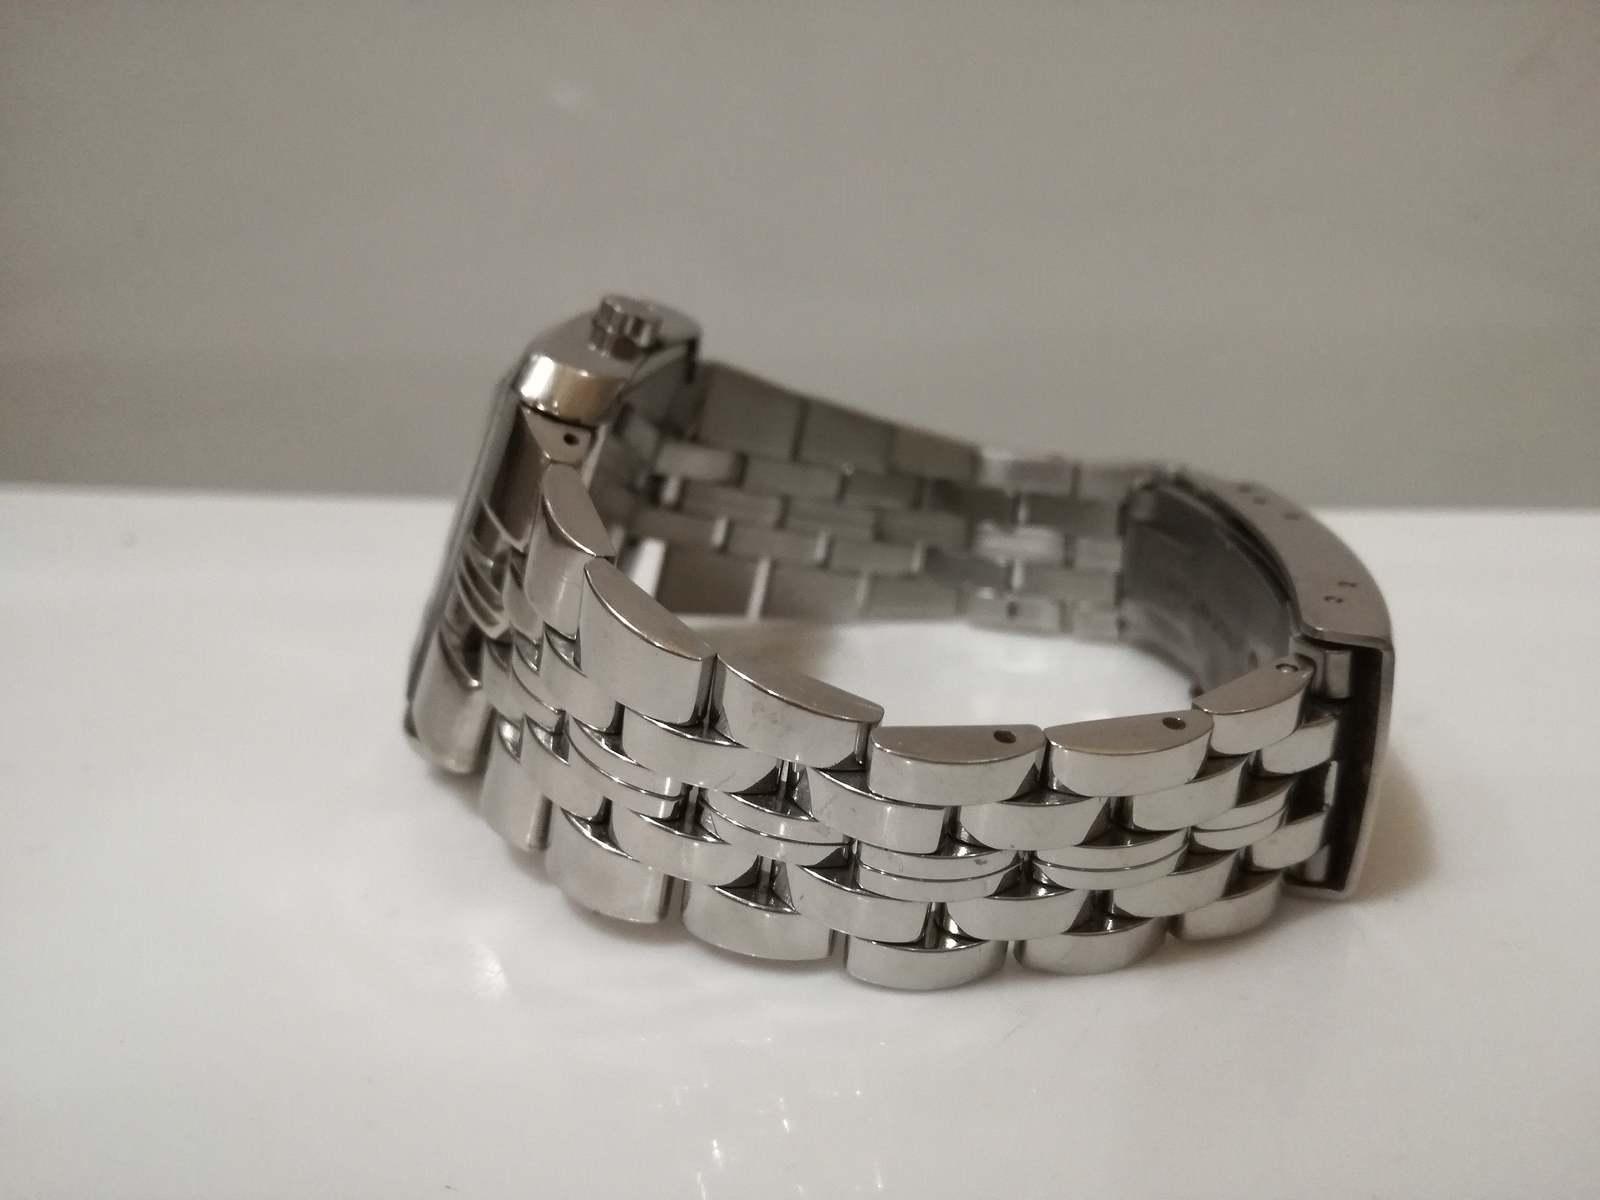 unisex Dress watch /   Police watch / quart watch / metal watch / vintage ladies image 2